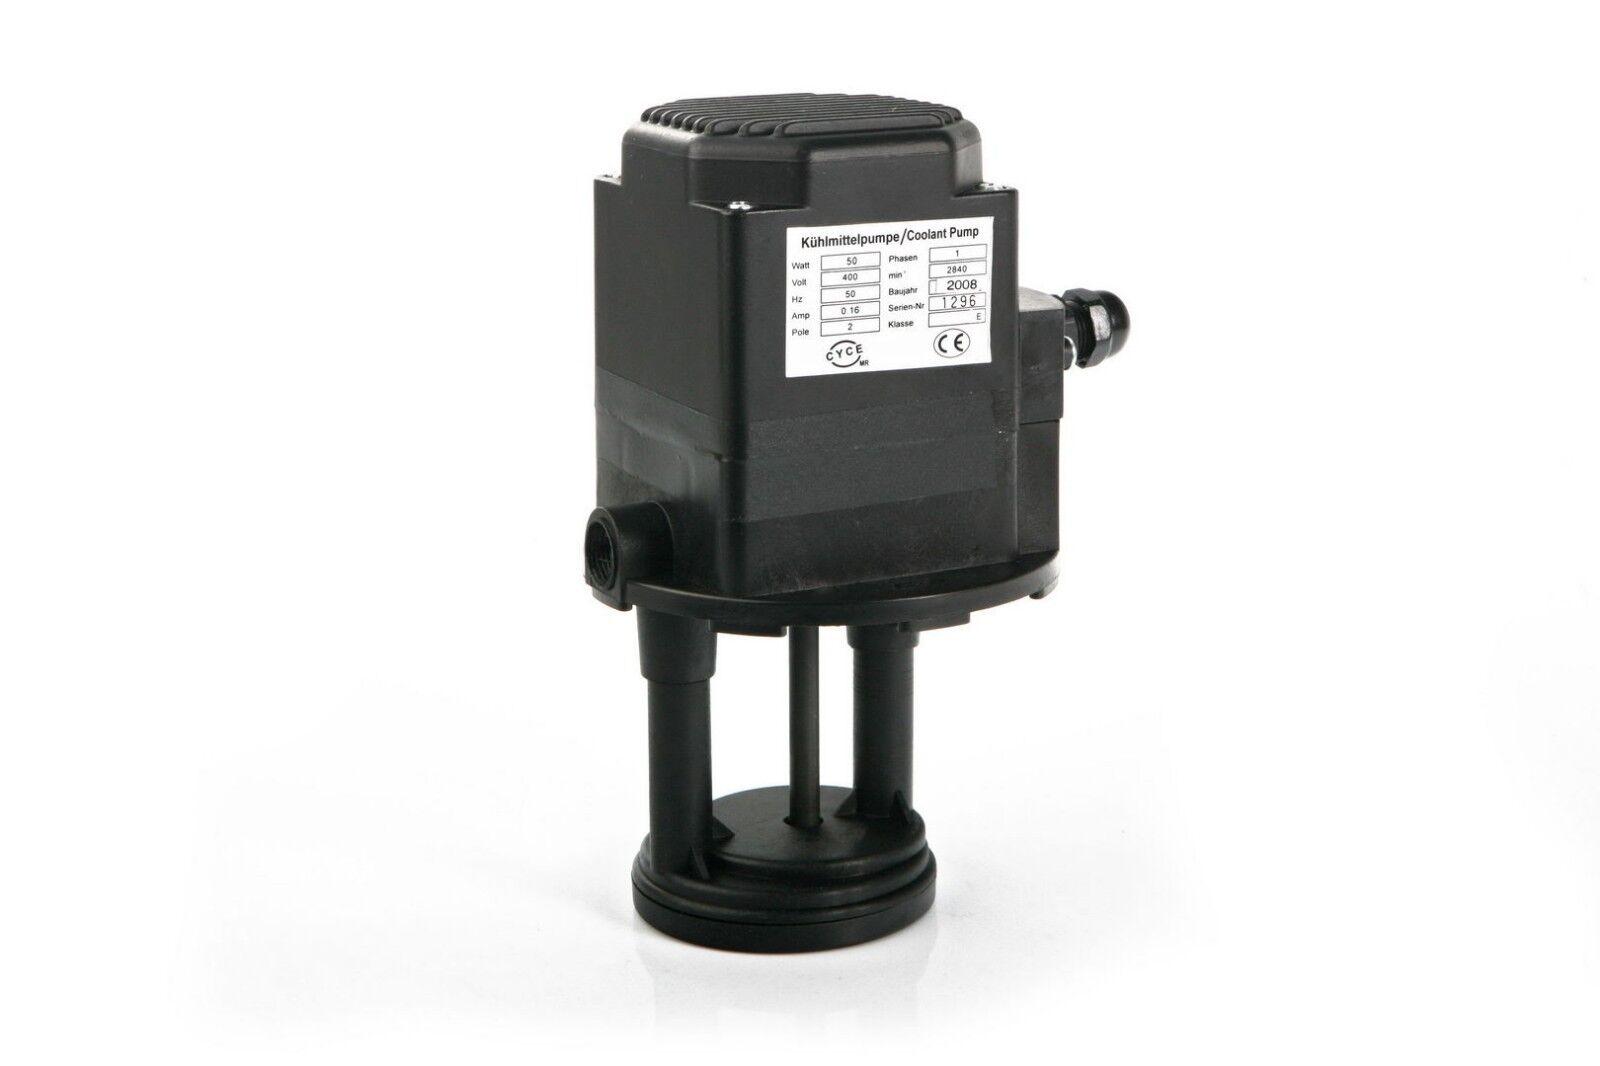 Universal Kühlpumpe  Kühlmittelpumpe Kühlmitteleinrichtung 230 Volt Nr. 1120